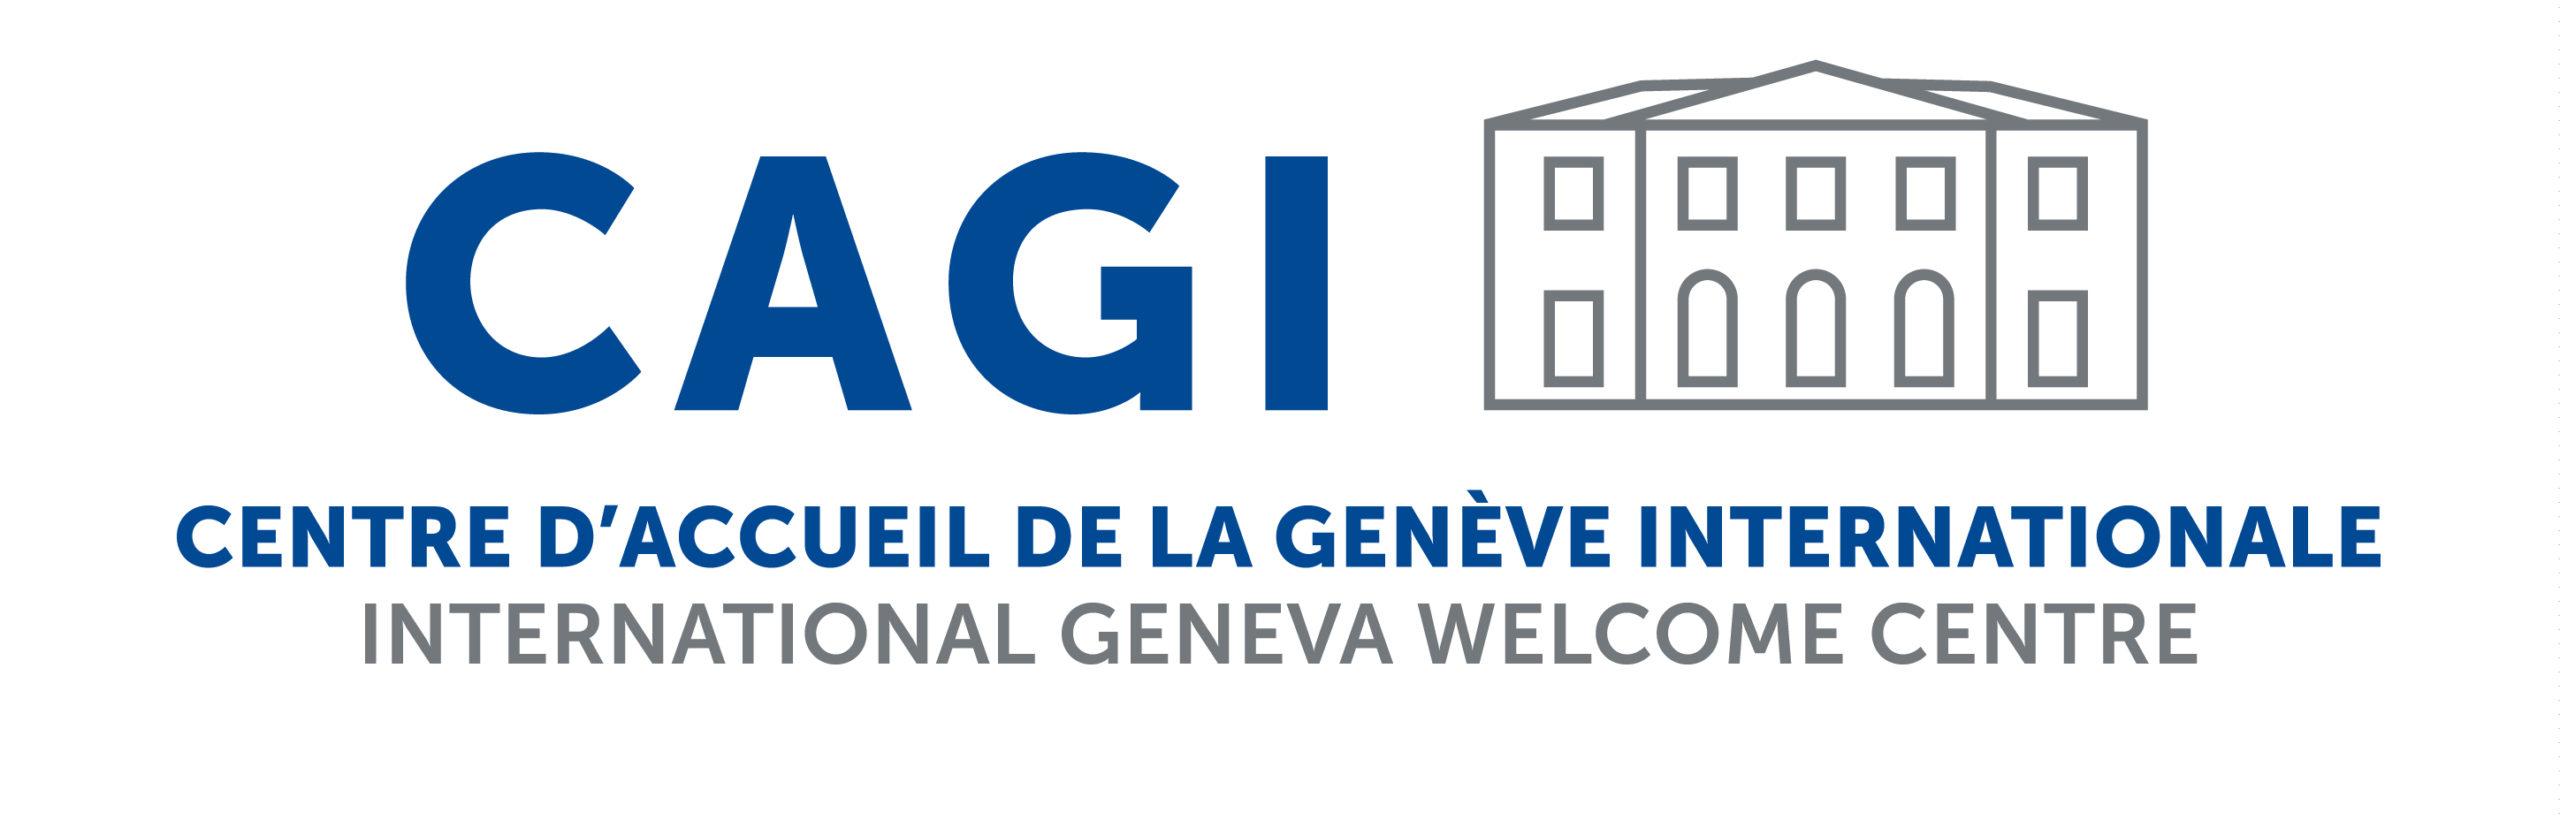 International Geneva Welcome Centre